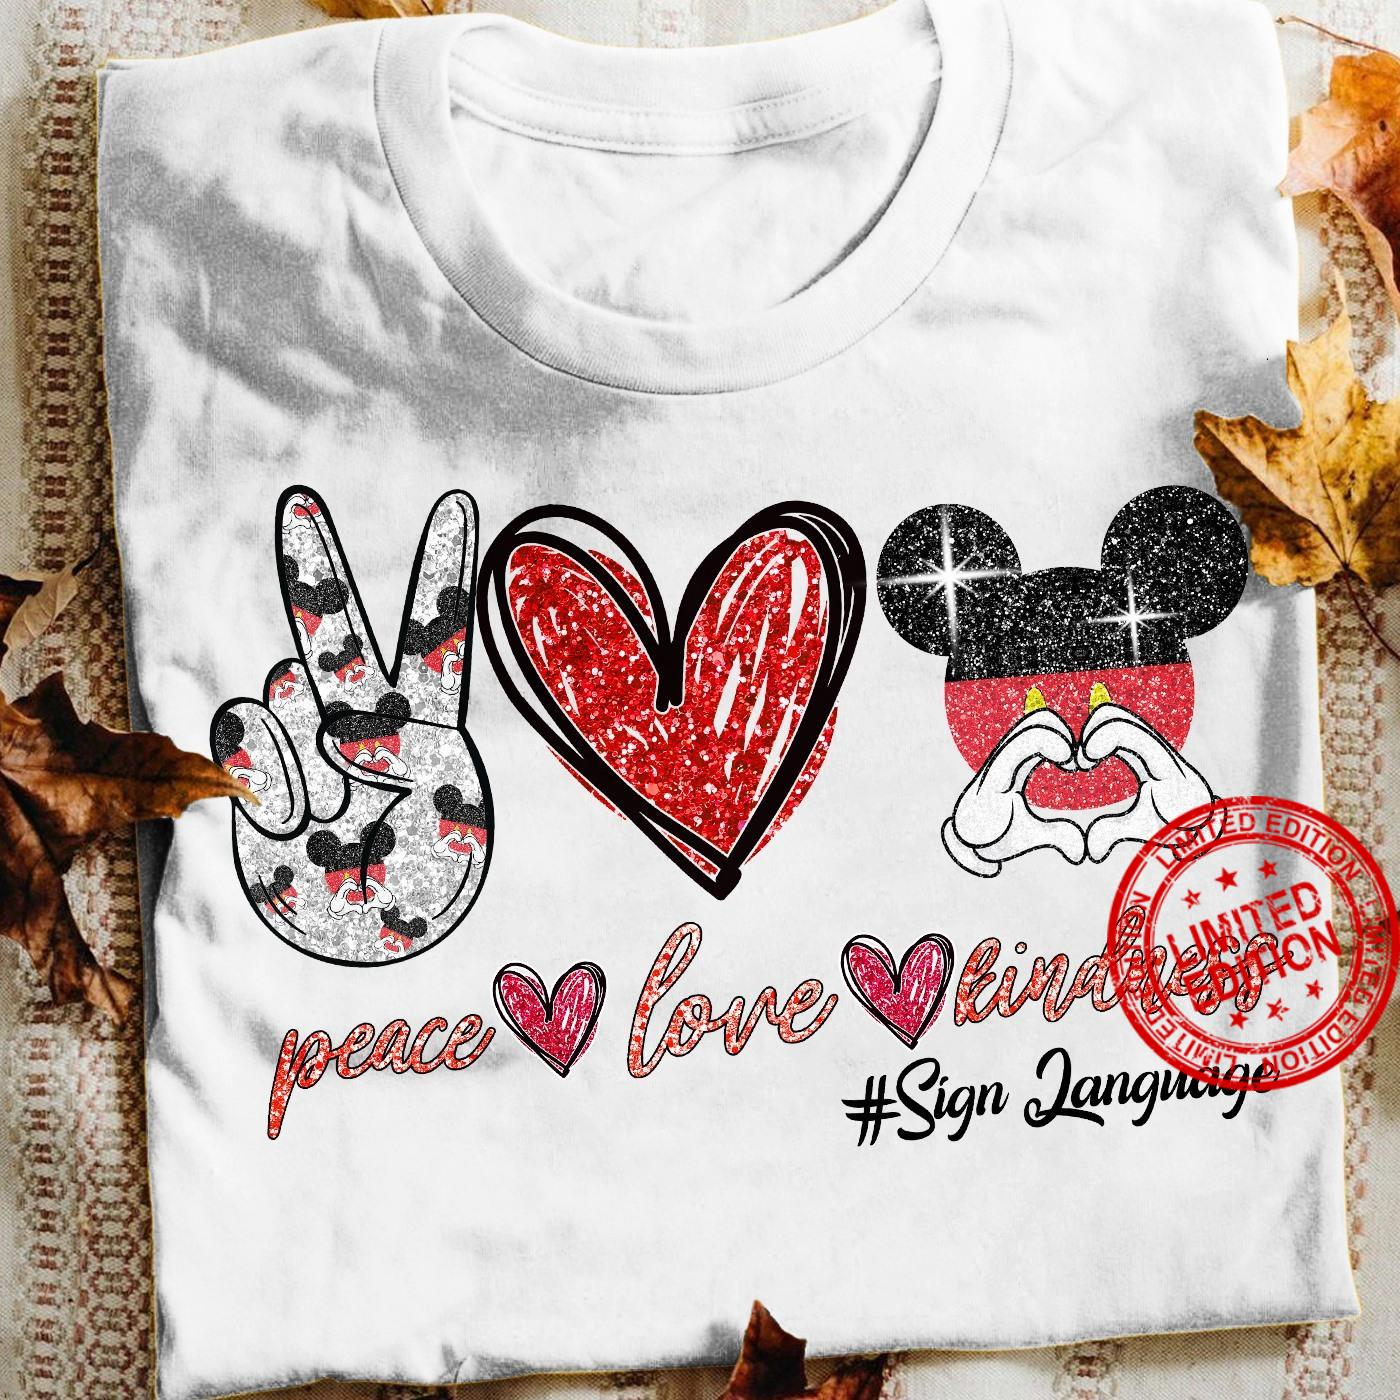 Peace Love Kindness Sign Language Shirt